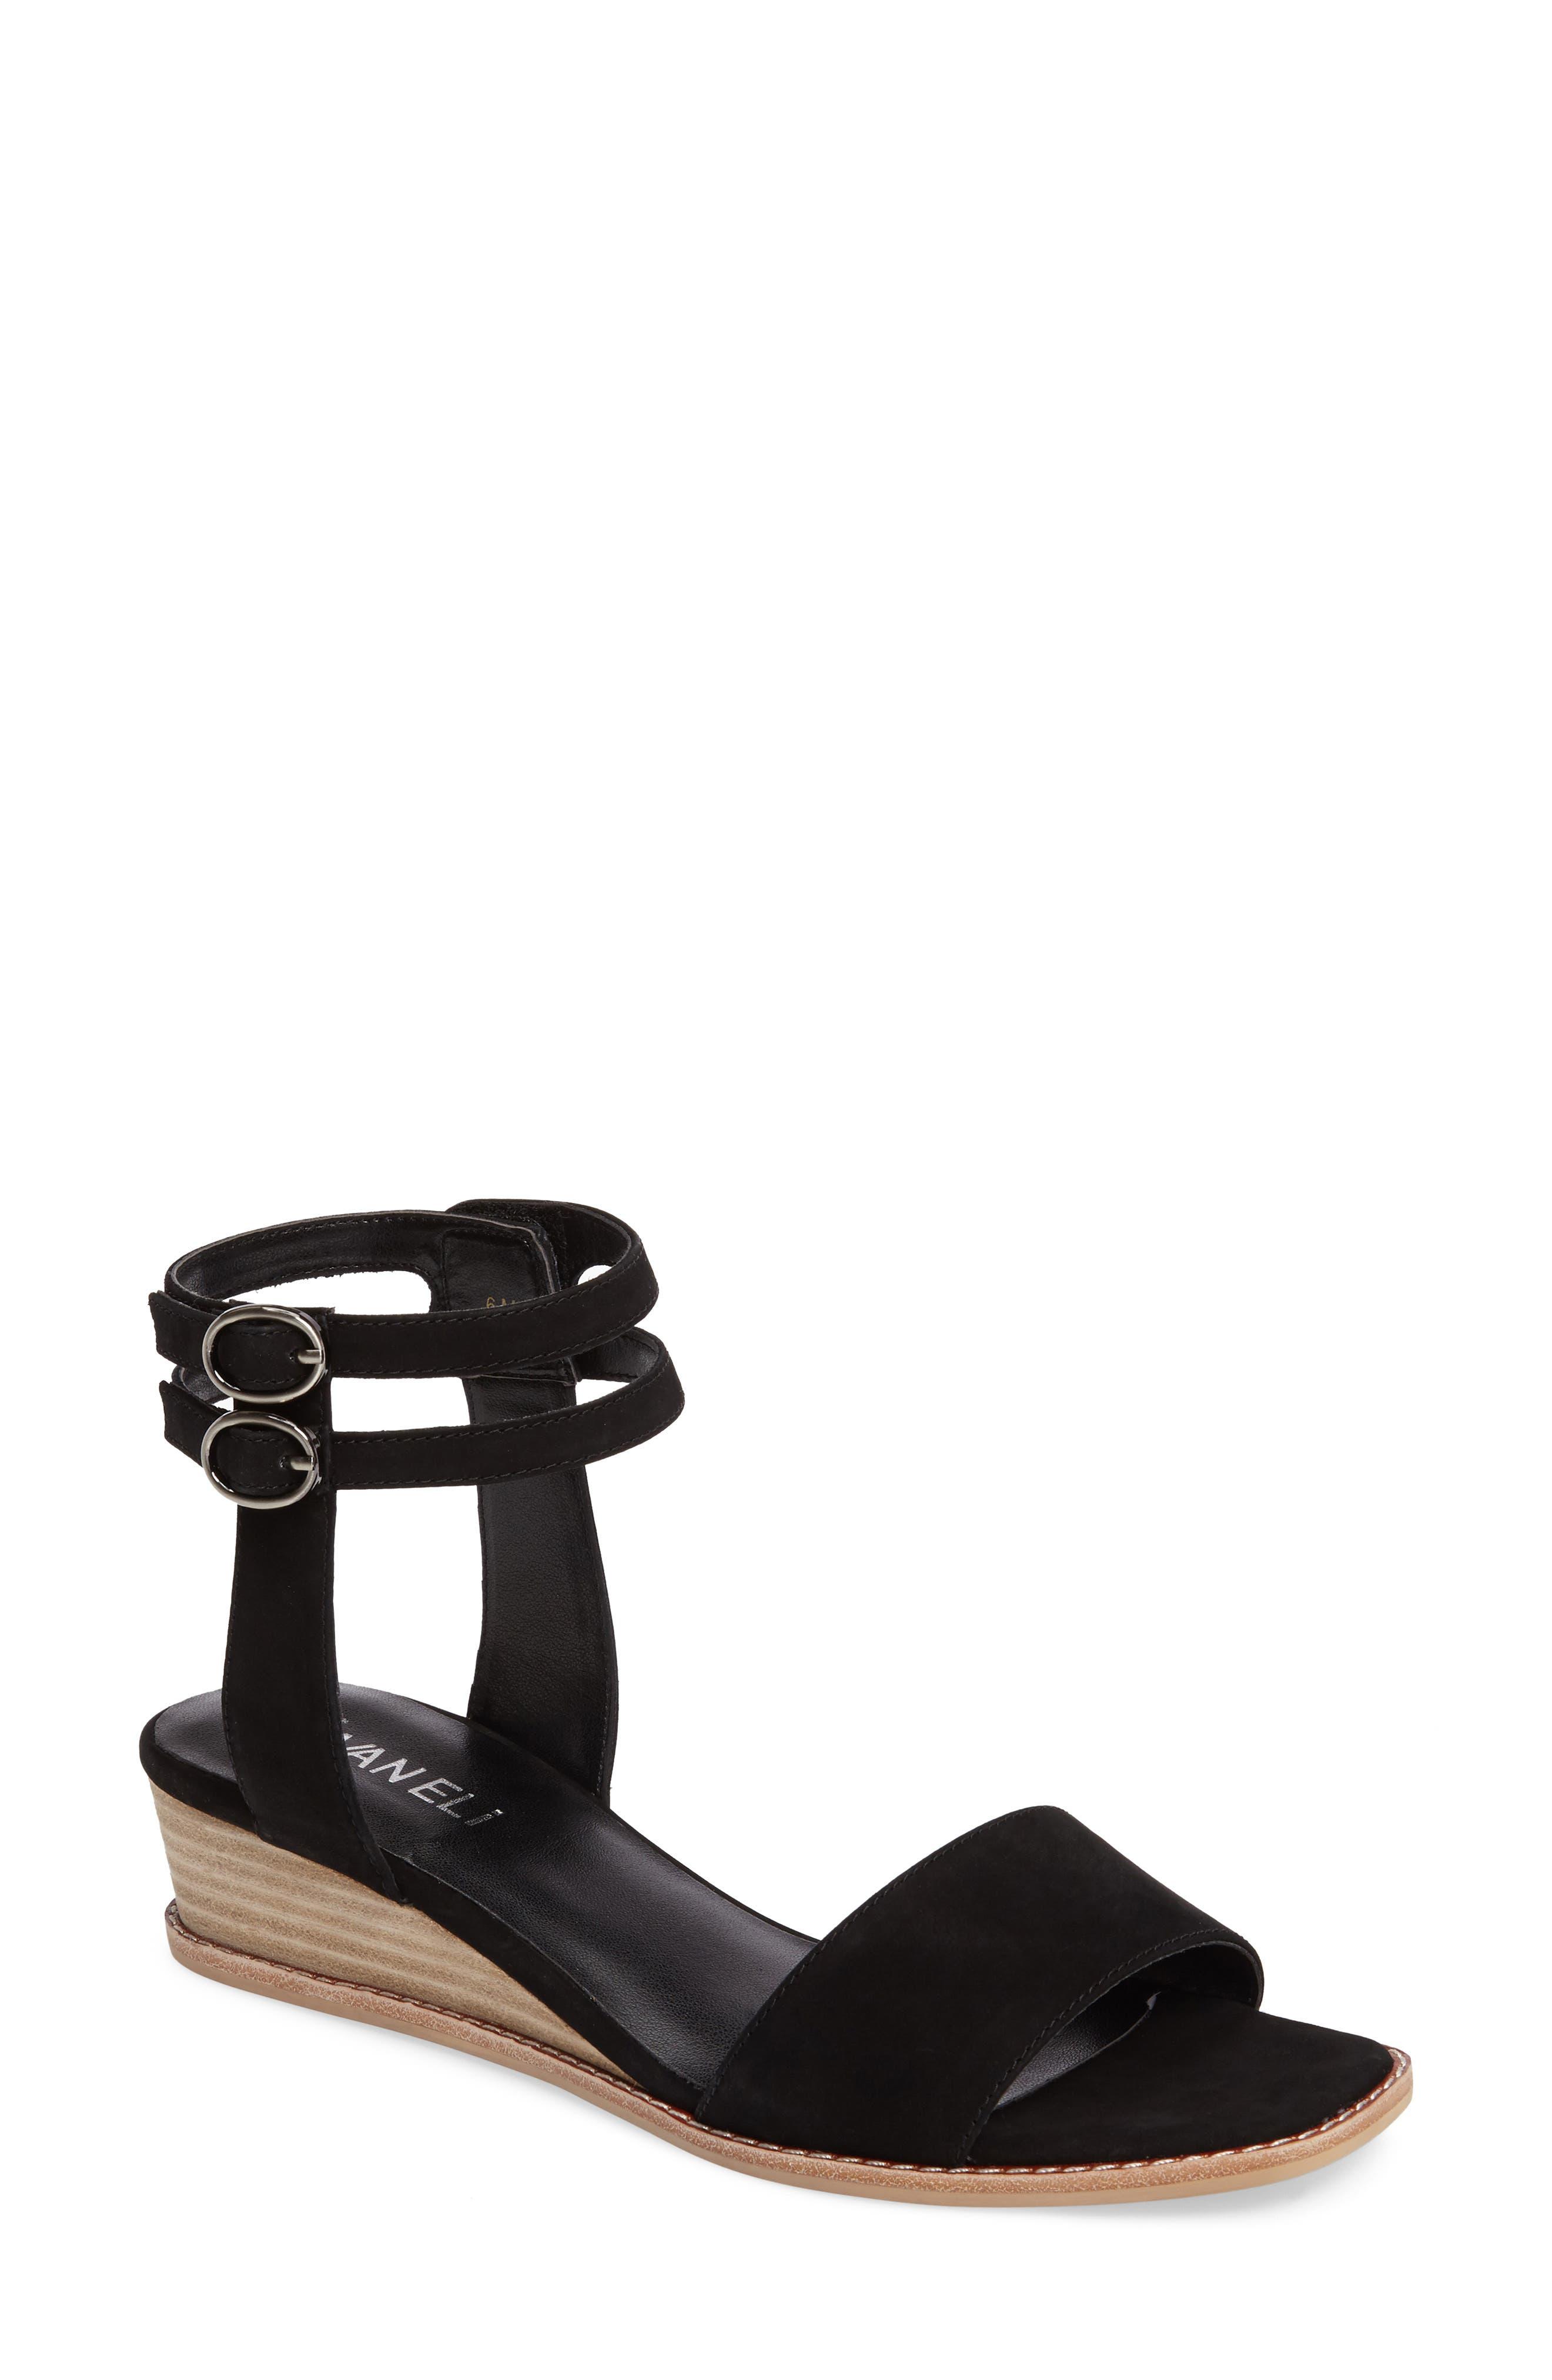 Jarita Ankle Strap Sandal,                             Main thumbnail 1, color,                             001